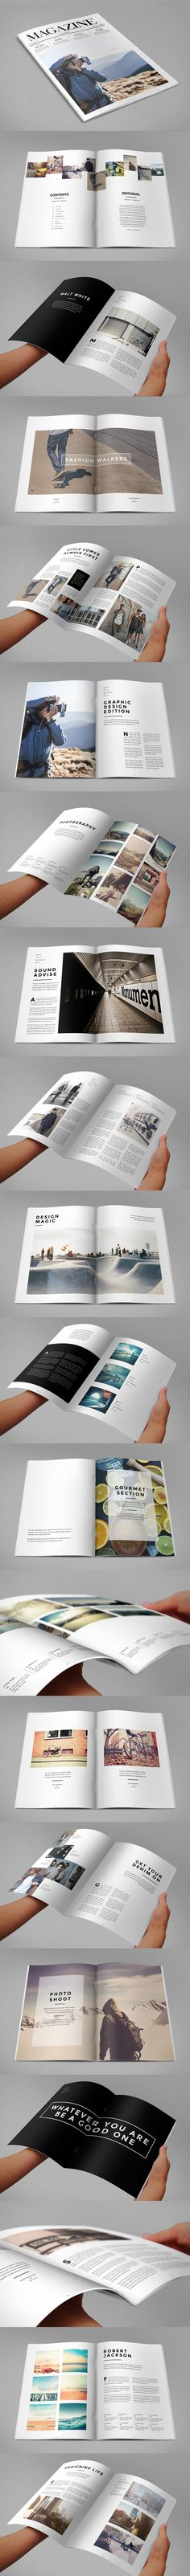 48 ideas design layout cover branding for 2019 Editorial Design Layouts, Magazine Layout Design, Graphic Design Layouts, Magazine Layouts, Graphisches Design, Page Design, Book Design, Cover Design, Interior Design